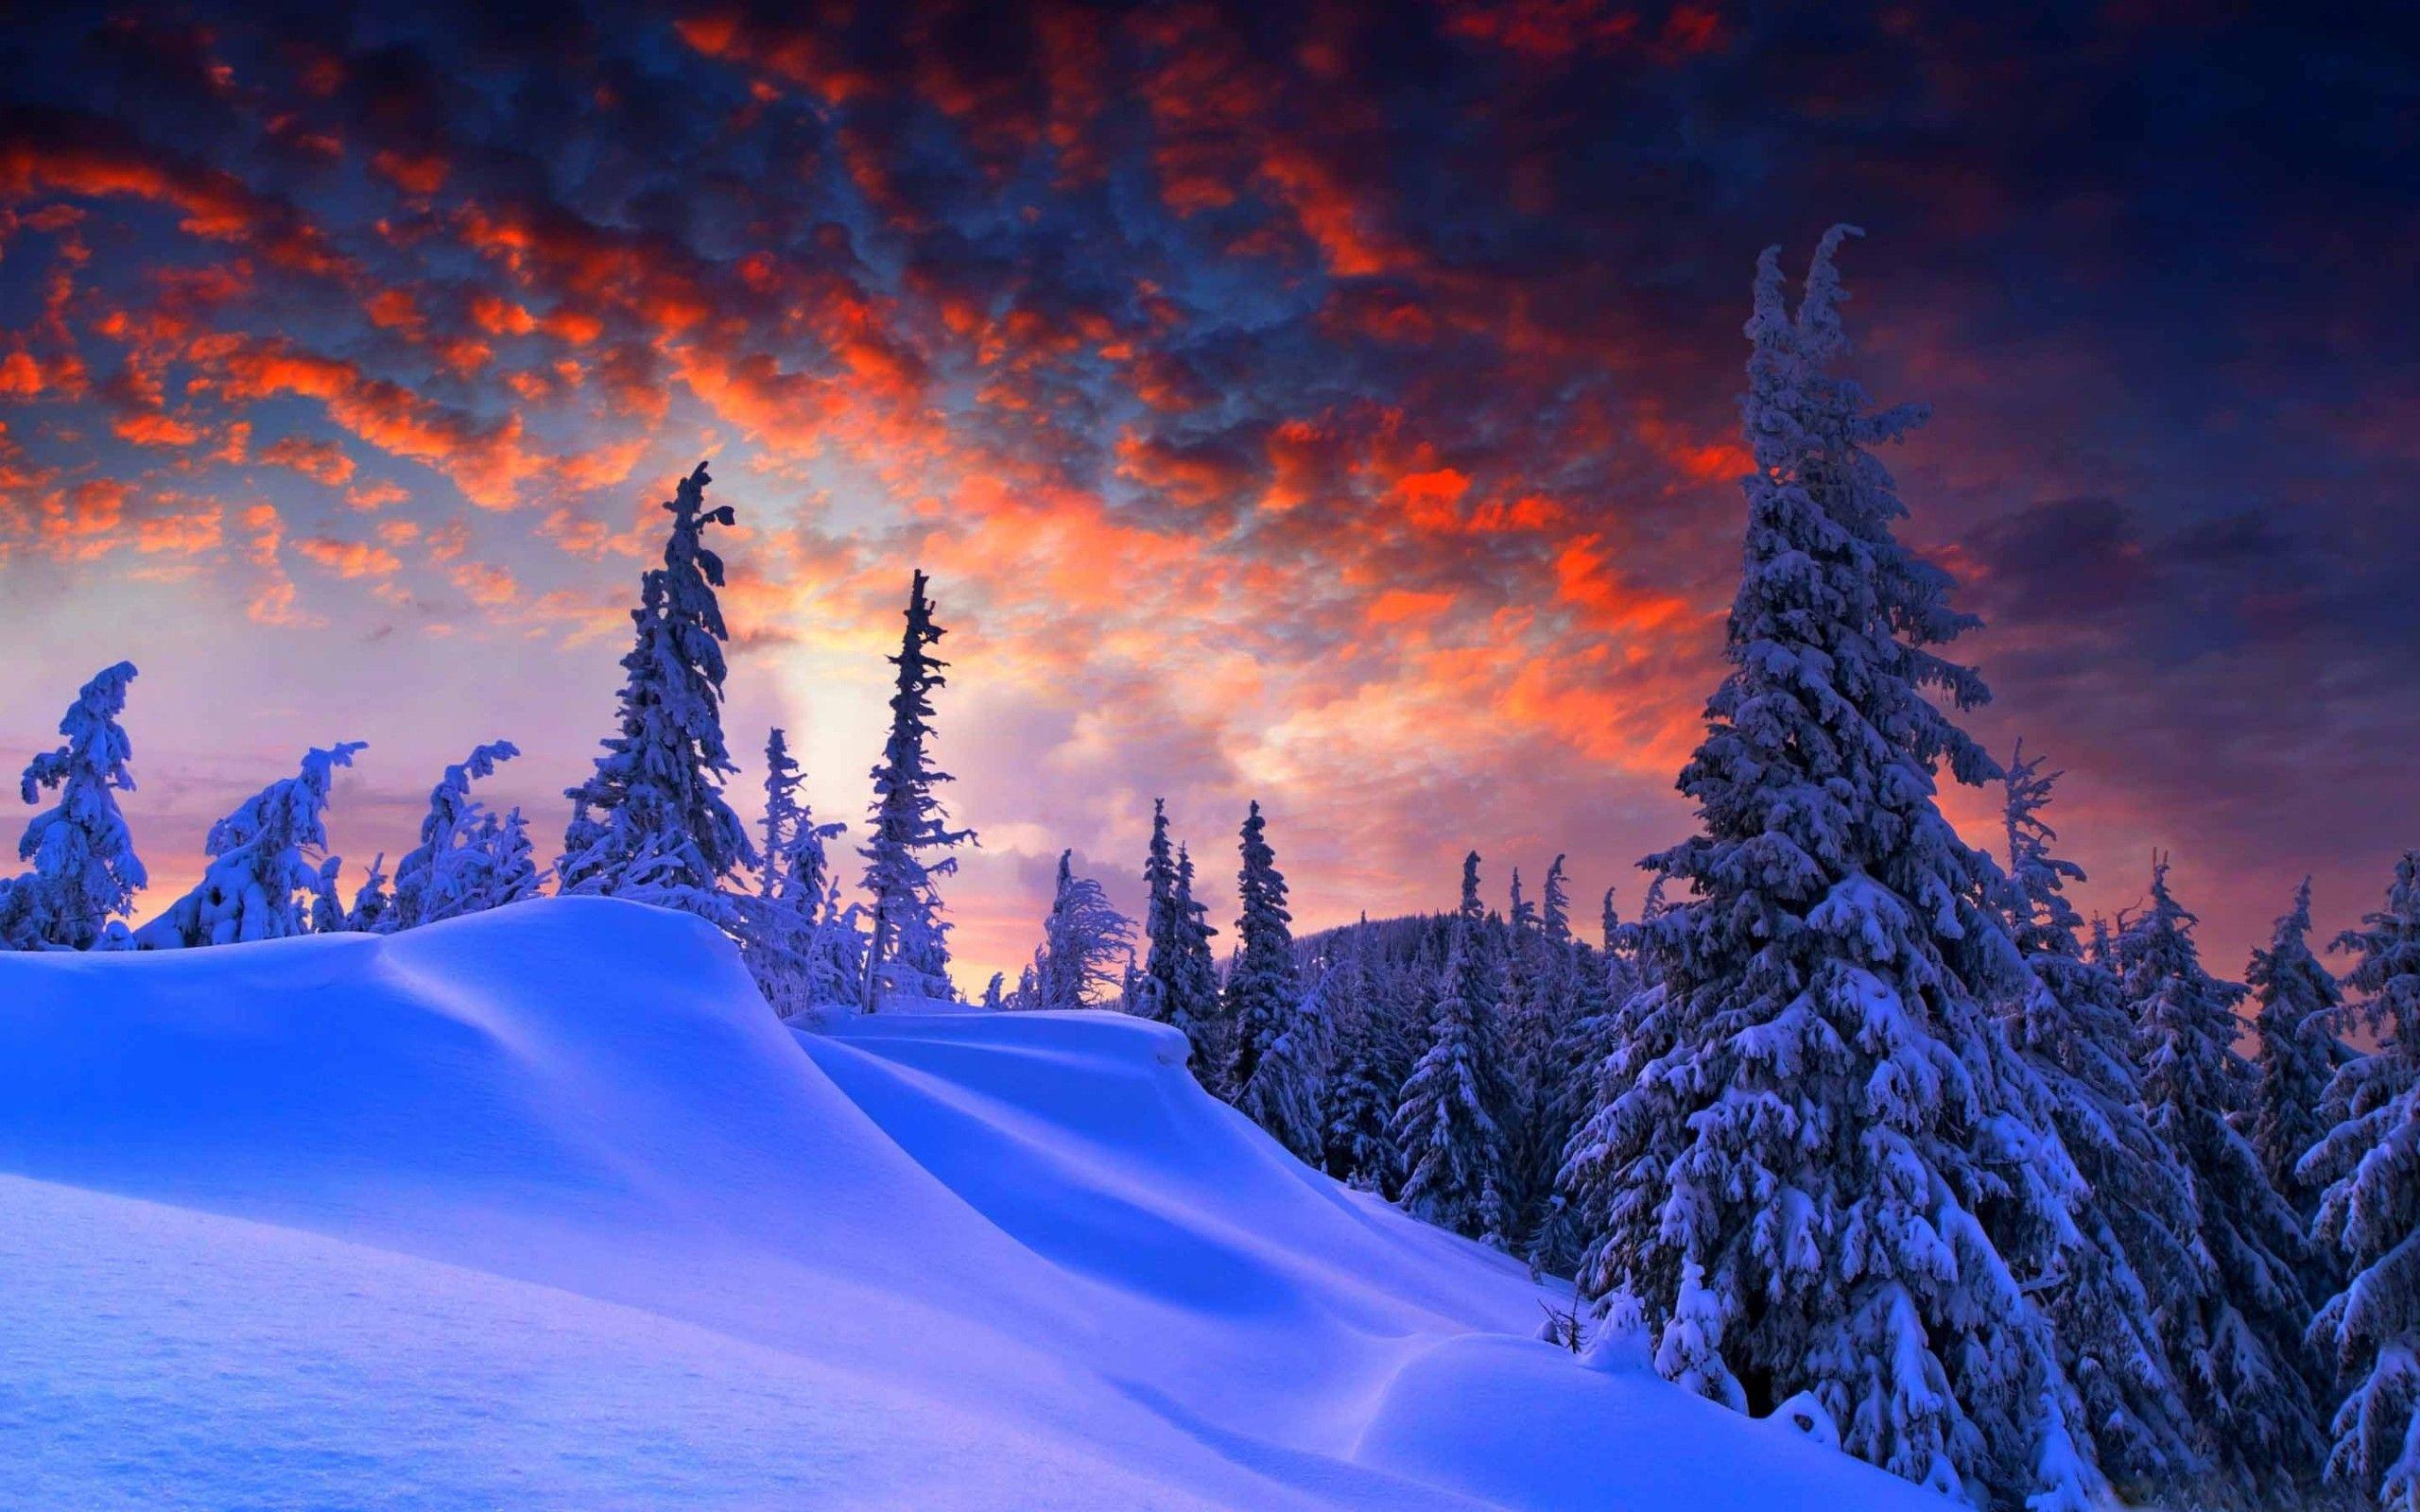 2560x1600 Pro 15 Inch 1440x900 Download Macbook Pro 15 Inch Retina 2880x1800 Download Winter Wallpaper Hd Winter Wallpaper Landscape Trees